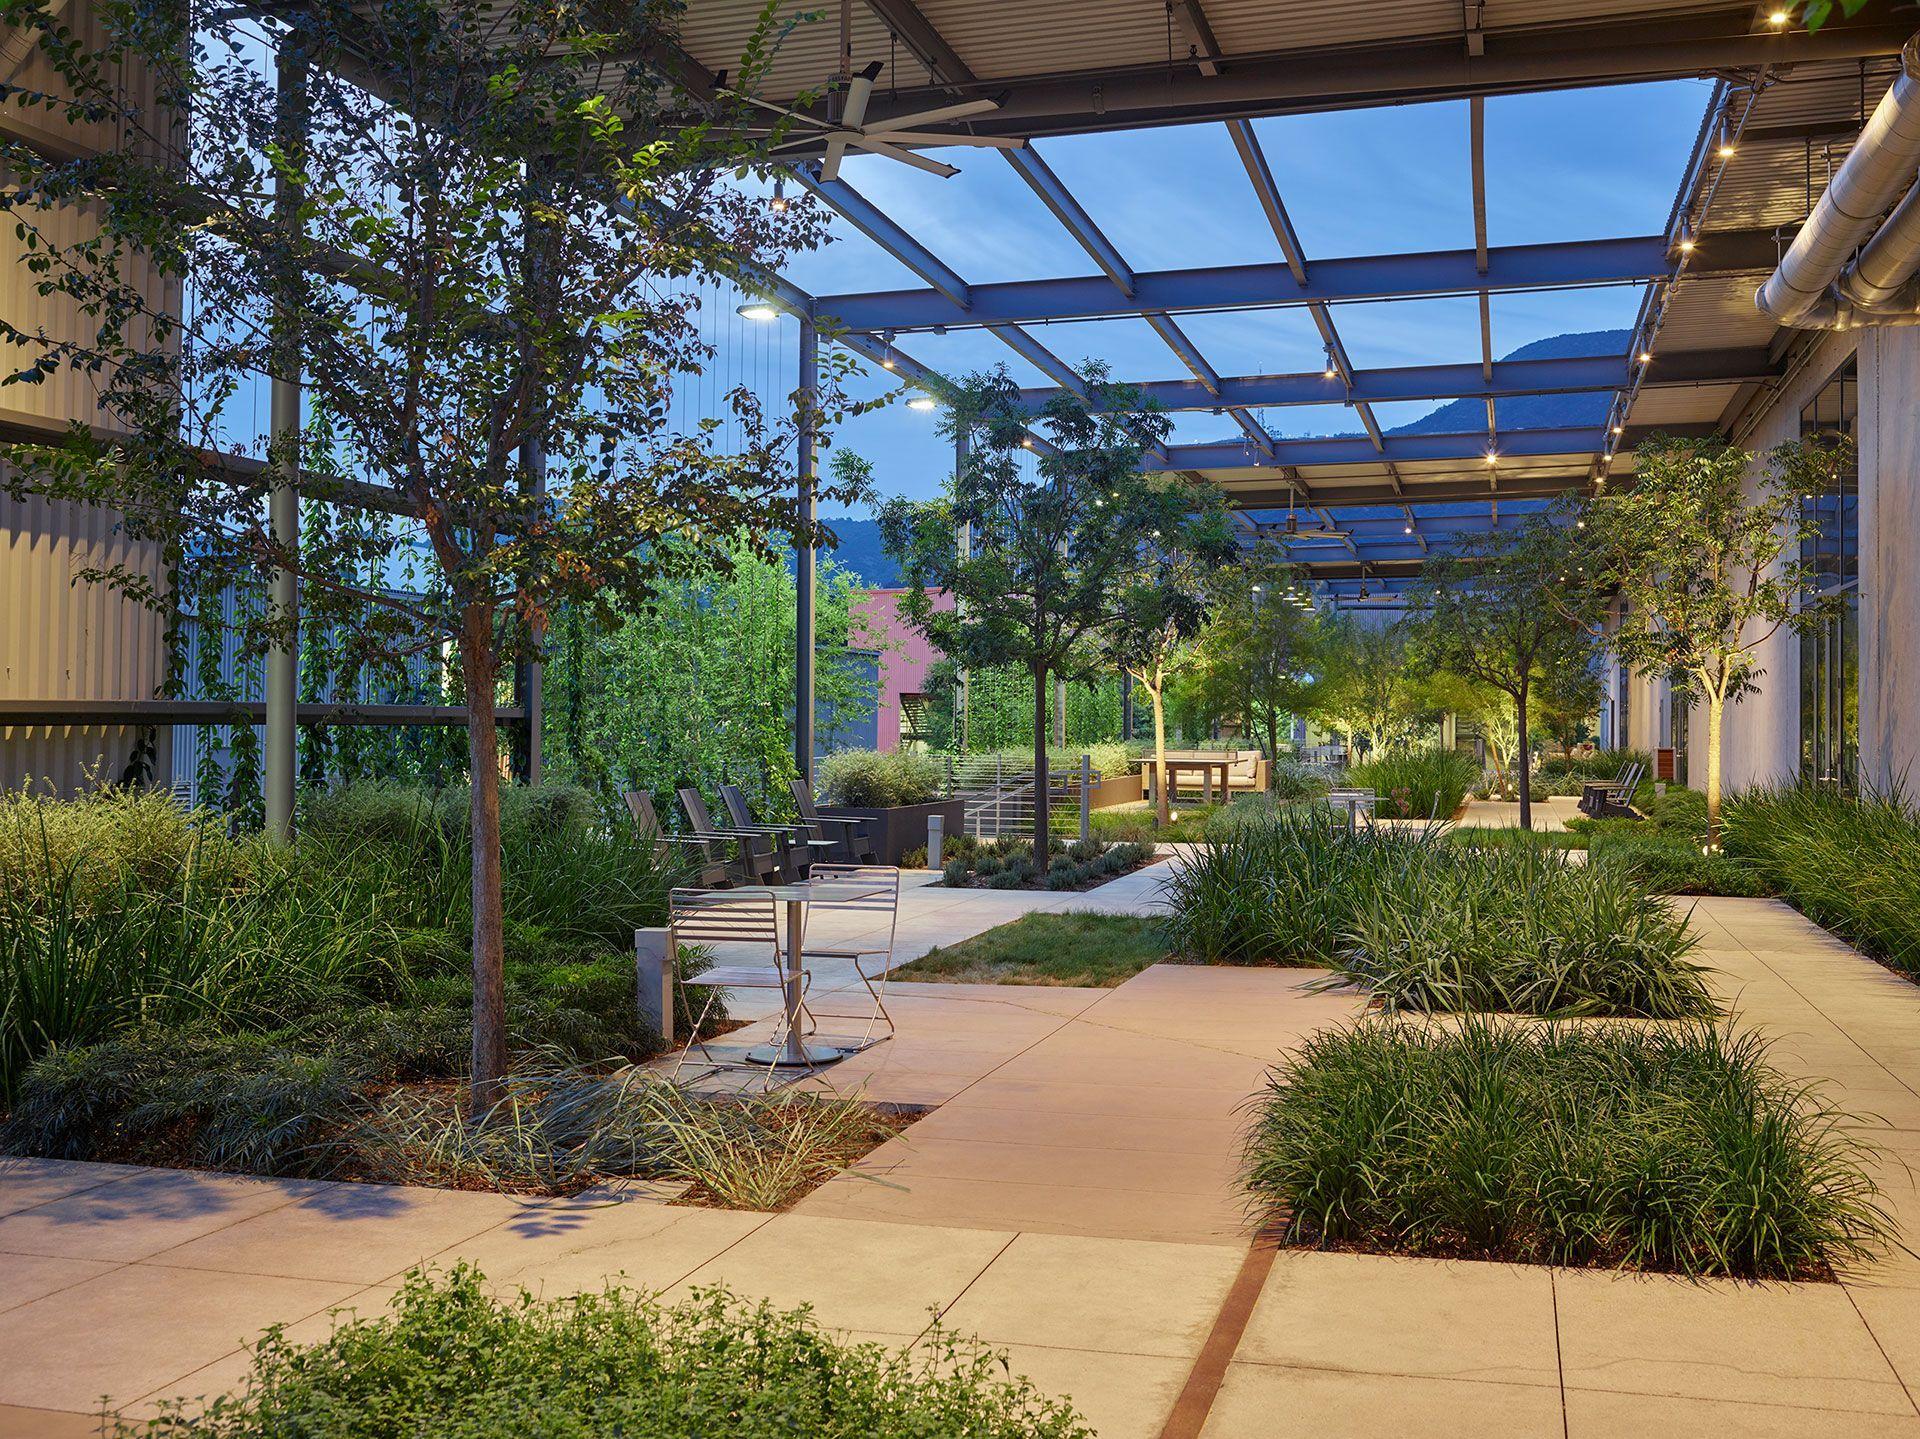 Sierra Bonita Apartments Modern Landscaping Backyard Landscaping Modern Garden Design Urban Landsca Modern Landscaping Modern Garden Design Courtyard Design